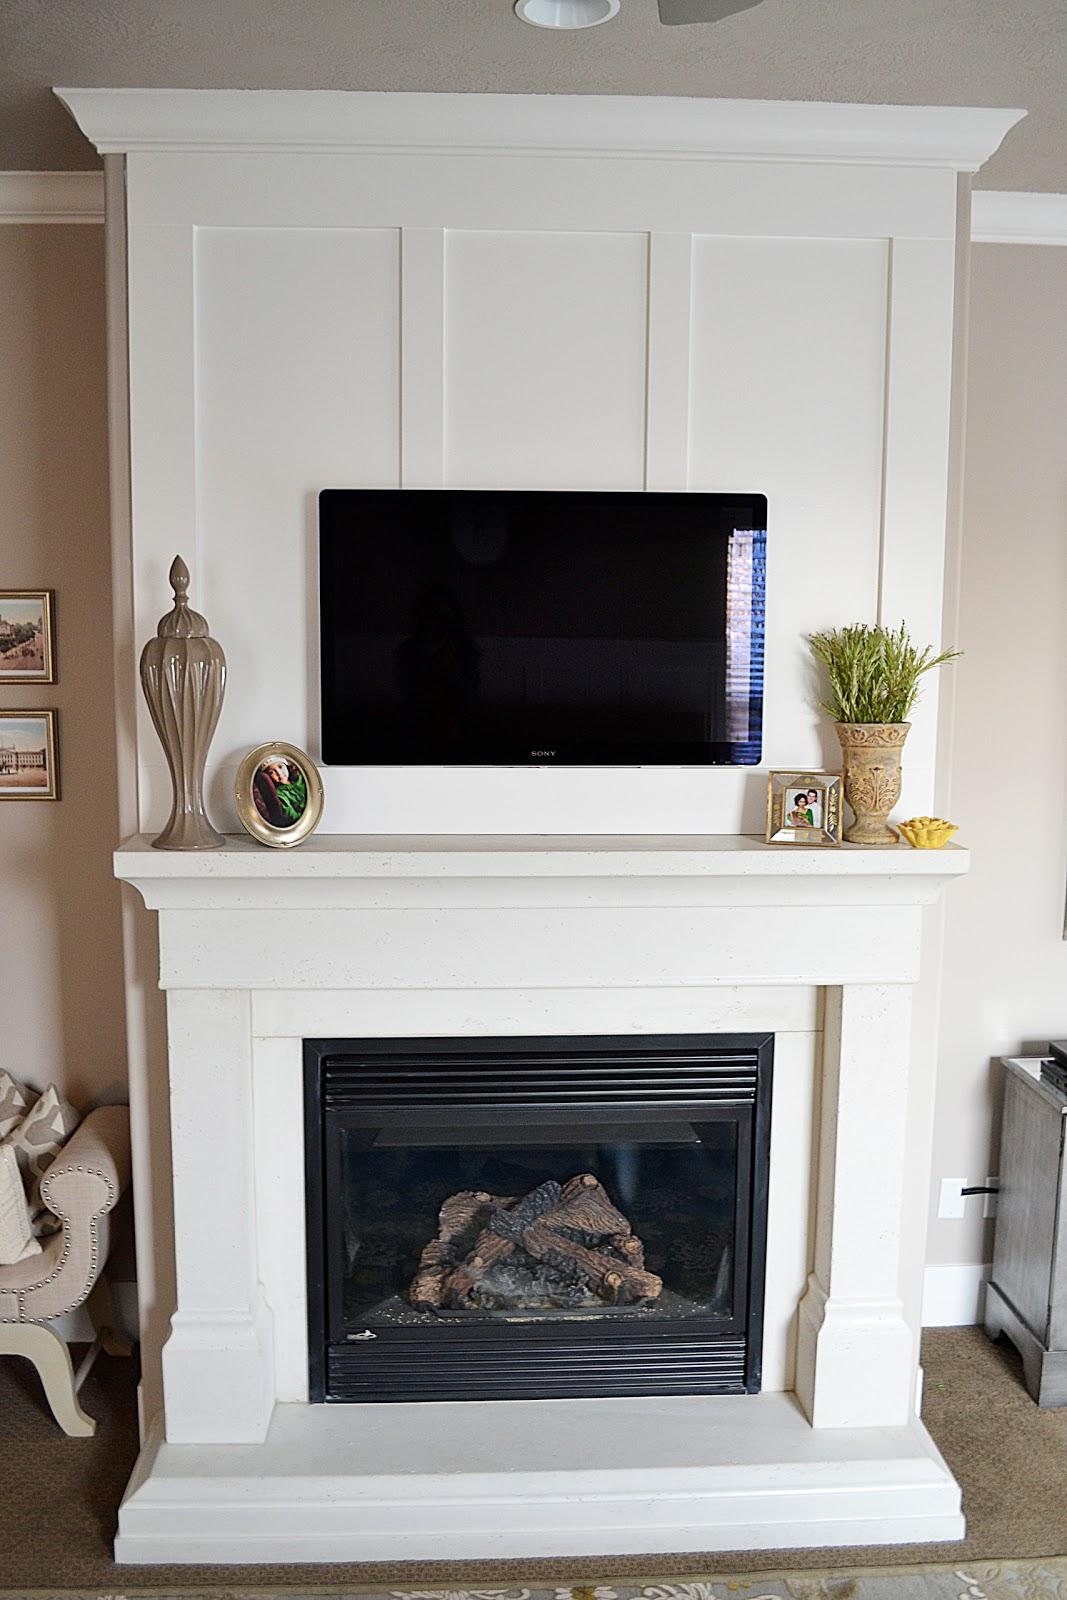 sita montgomery interiors master bedroom fireplace makeover reveal. Black Bedroom Furniture Sets. Home Design Ideas